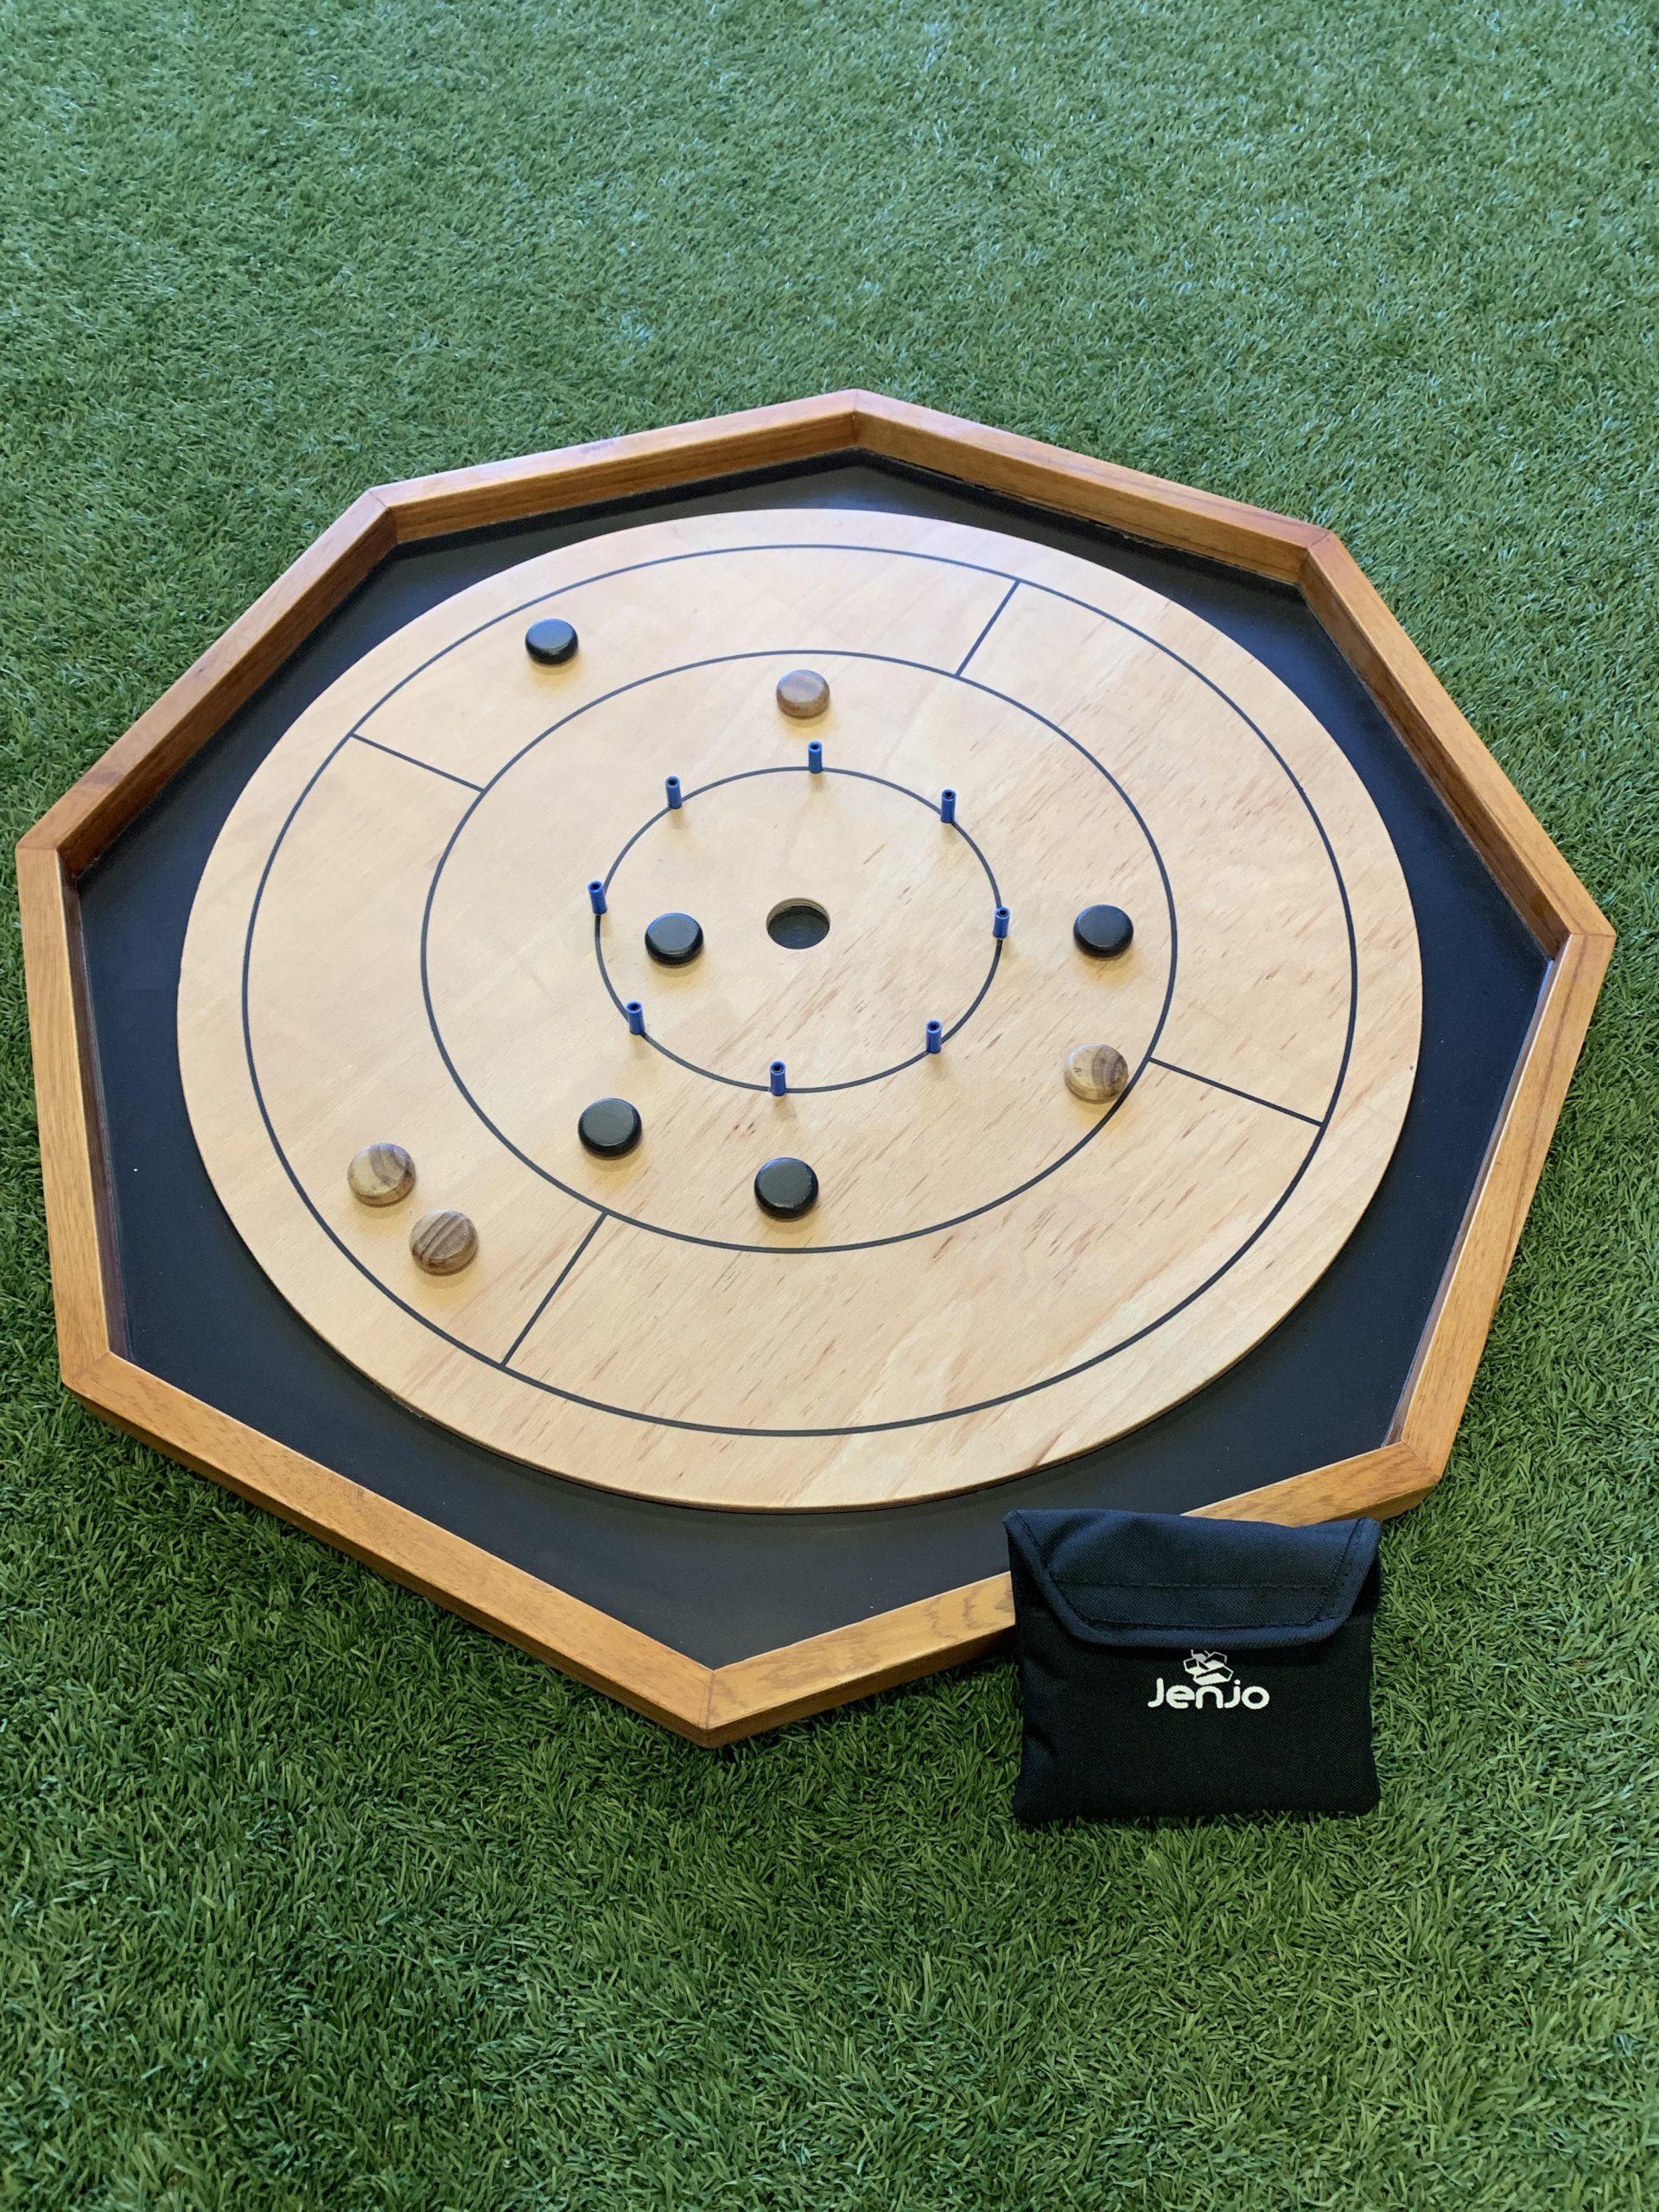 Championship Crokinole Octagone Frame 80cm Diameter